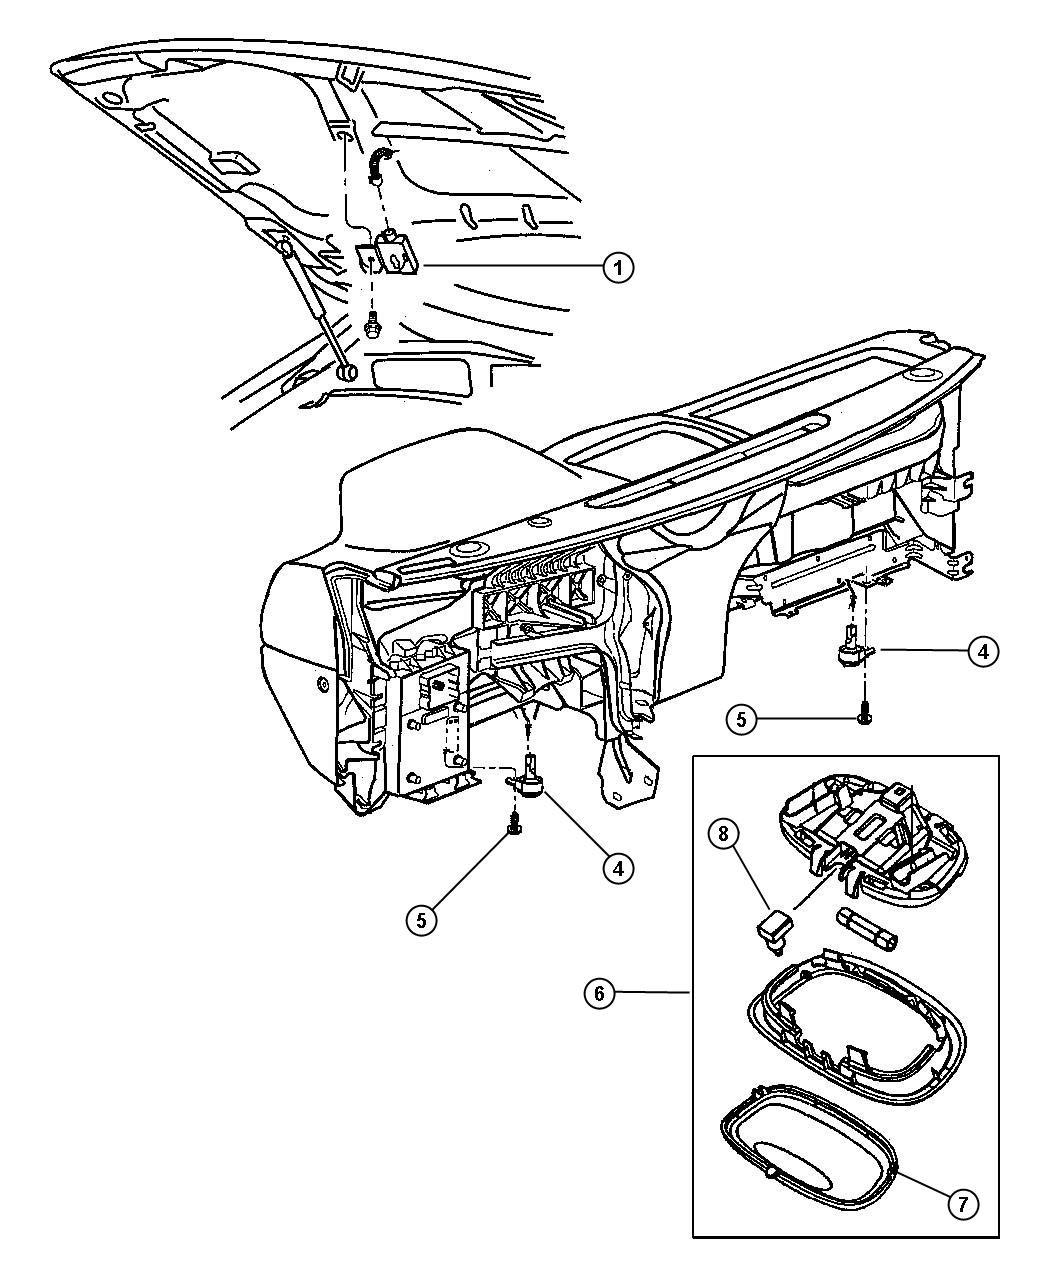 35 Chrysler Parts Diagram